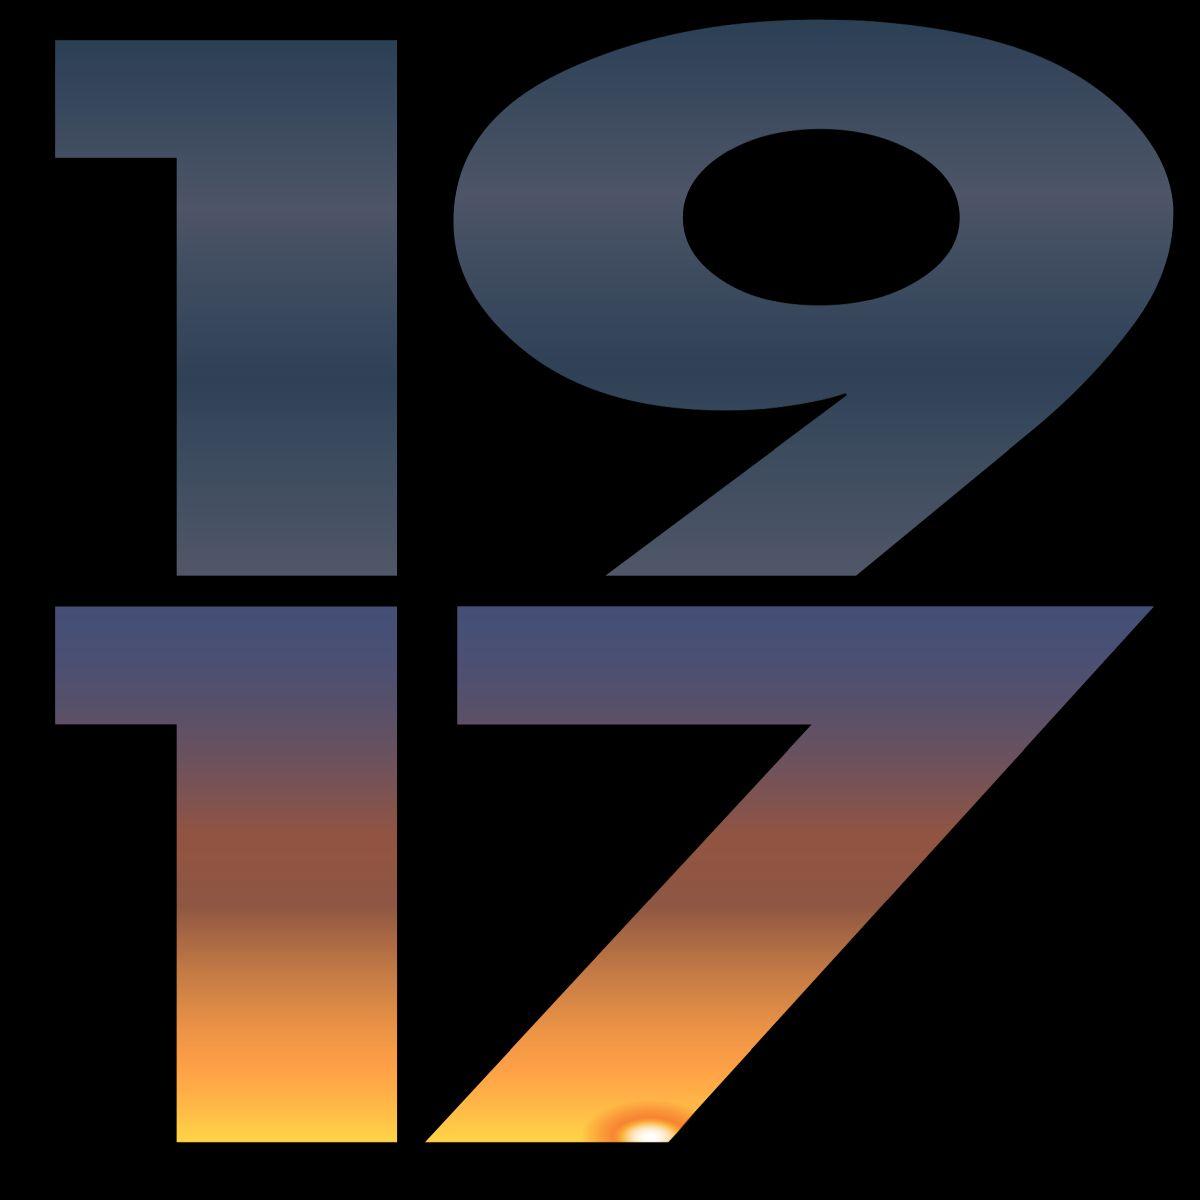 HD-Filme (z.B. 1917) für 3,99€ @ CHILI TV